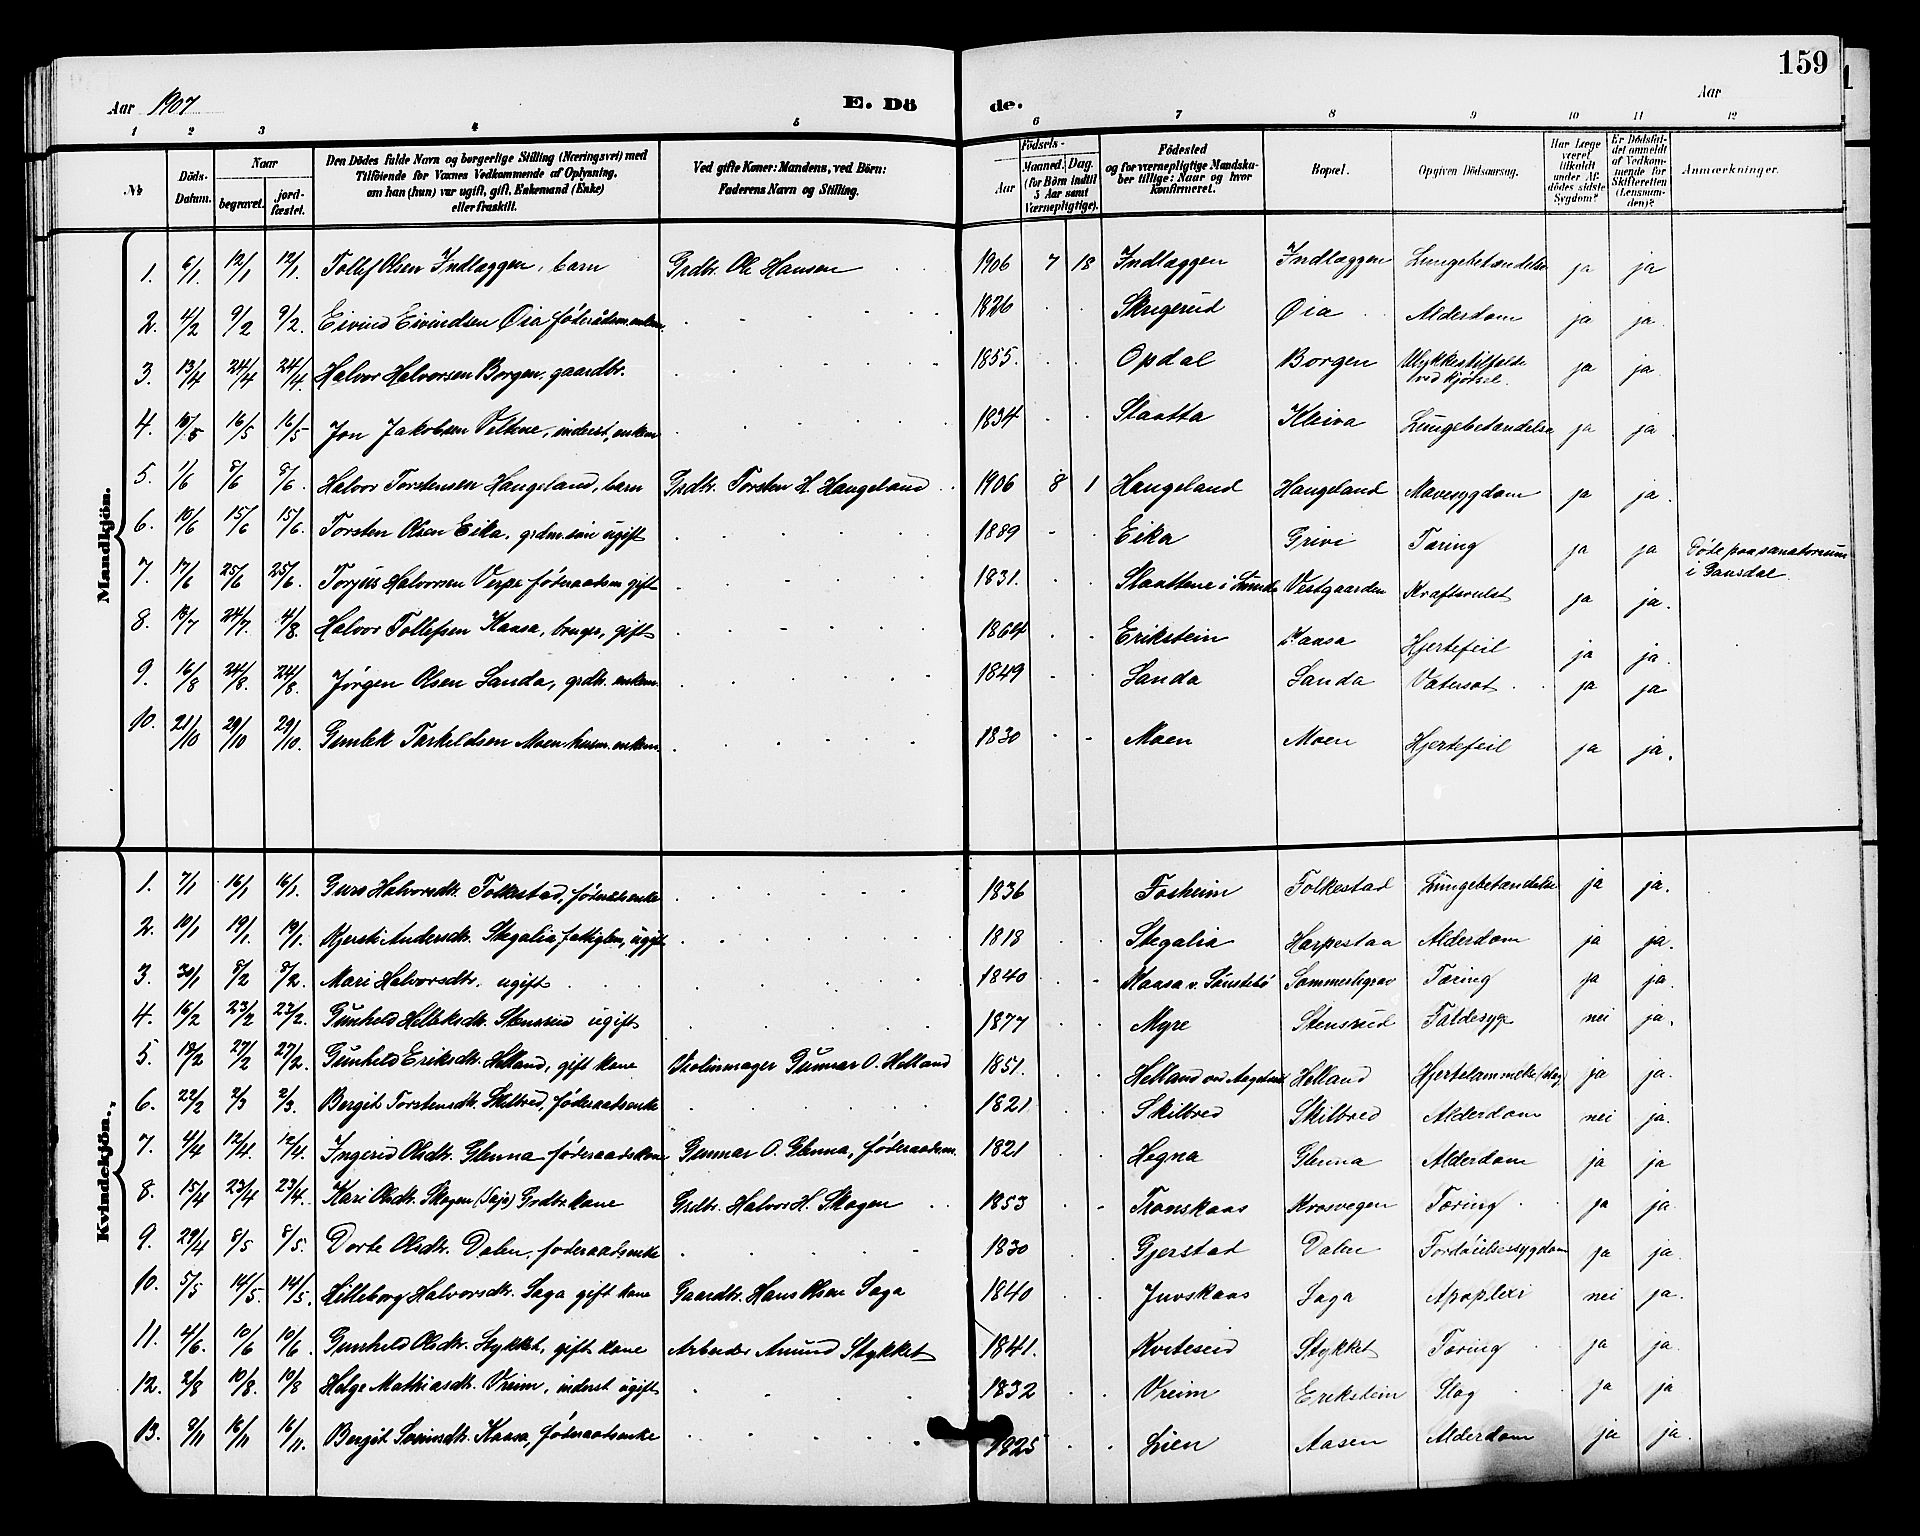 SAKO, Bø kirkebøker, G/Ga/L0006: Klokkerbok nr. 6, 1898-1909, s. 159